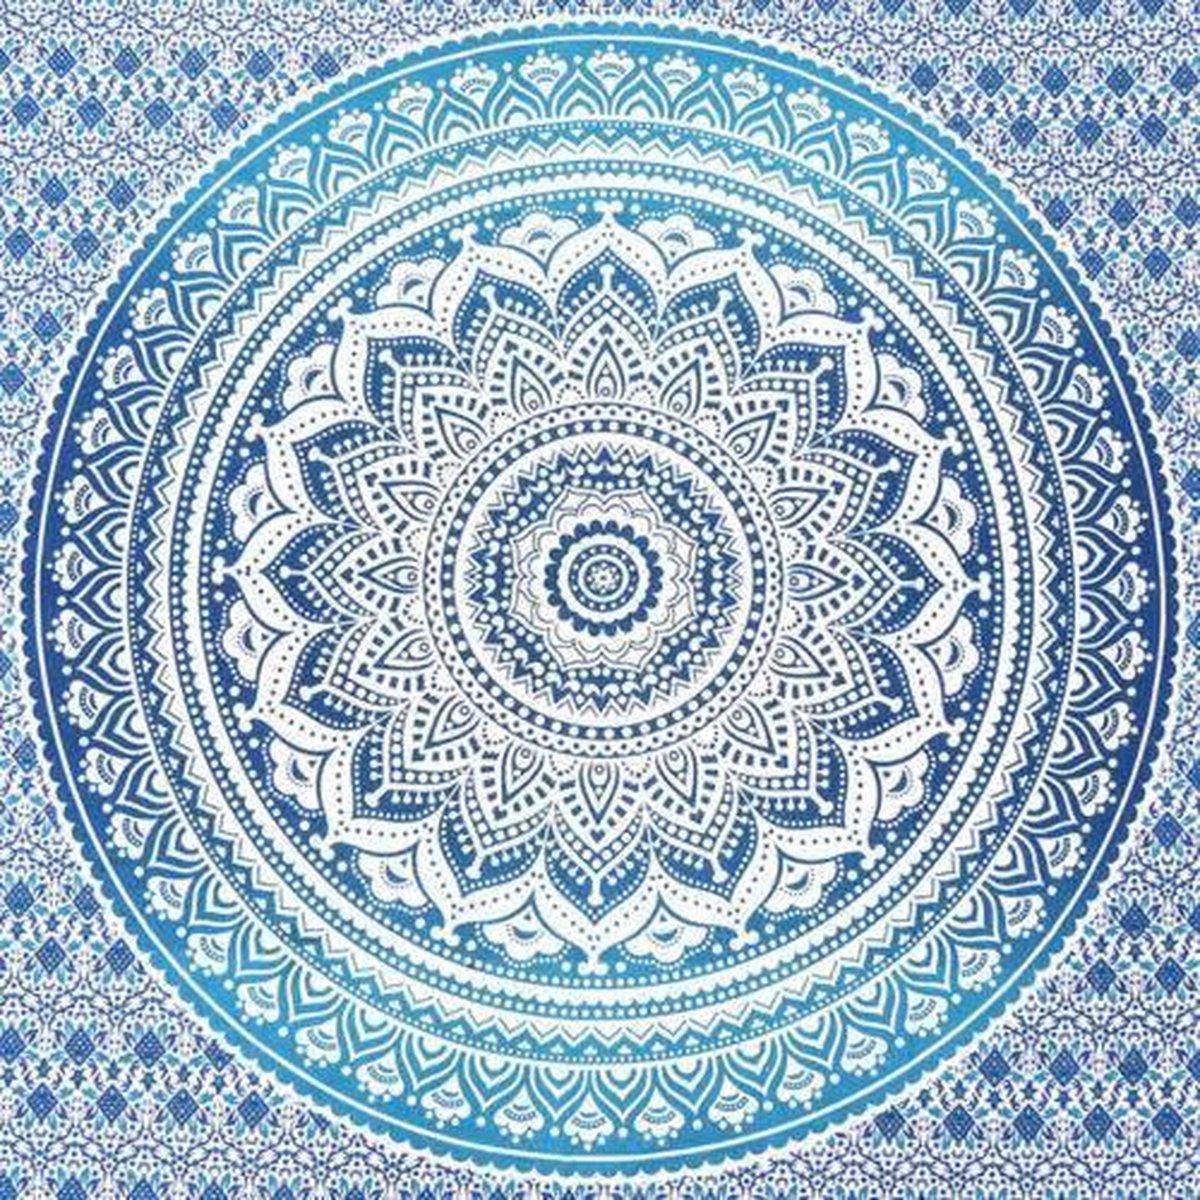 Strandlaken - Blauw - 2.10m x 2.40m - XXL - Tafelkleed - Picknickkleed - HANDMADE